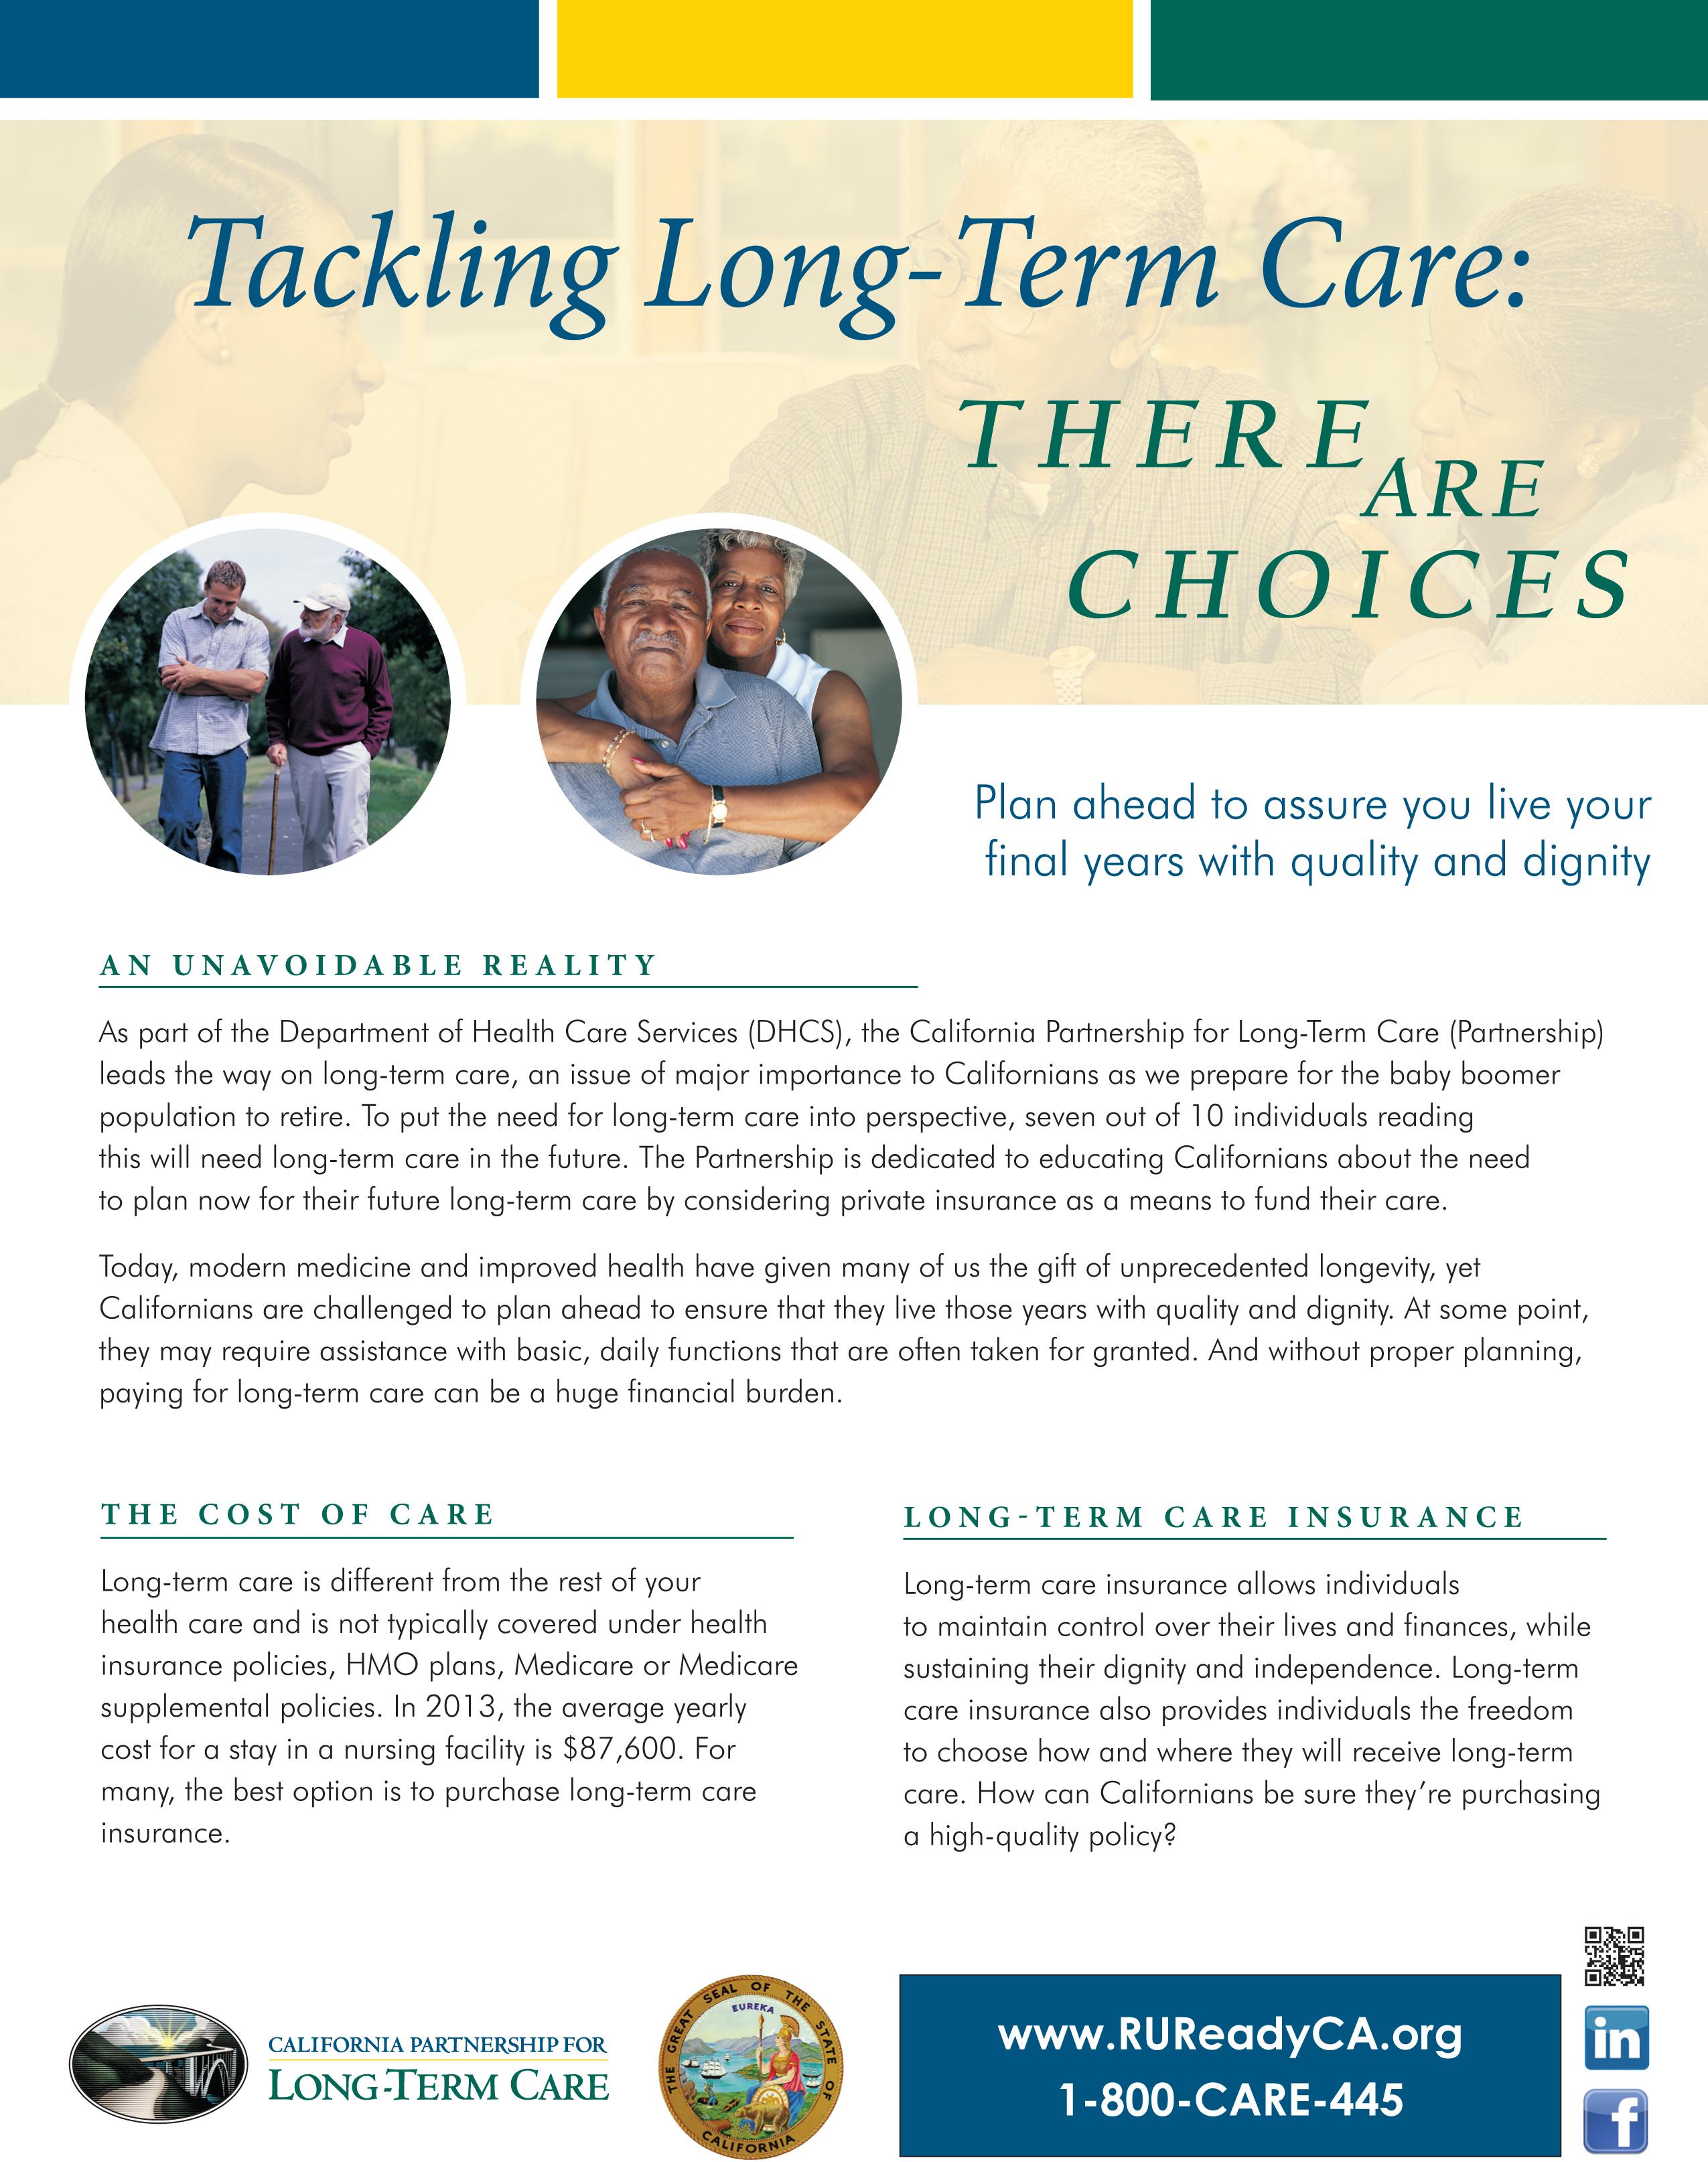 CPLTC Fact Sheet